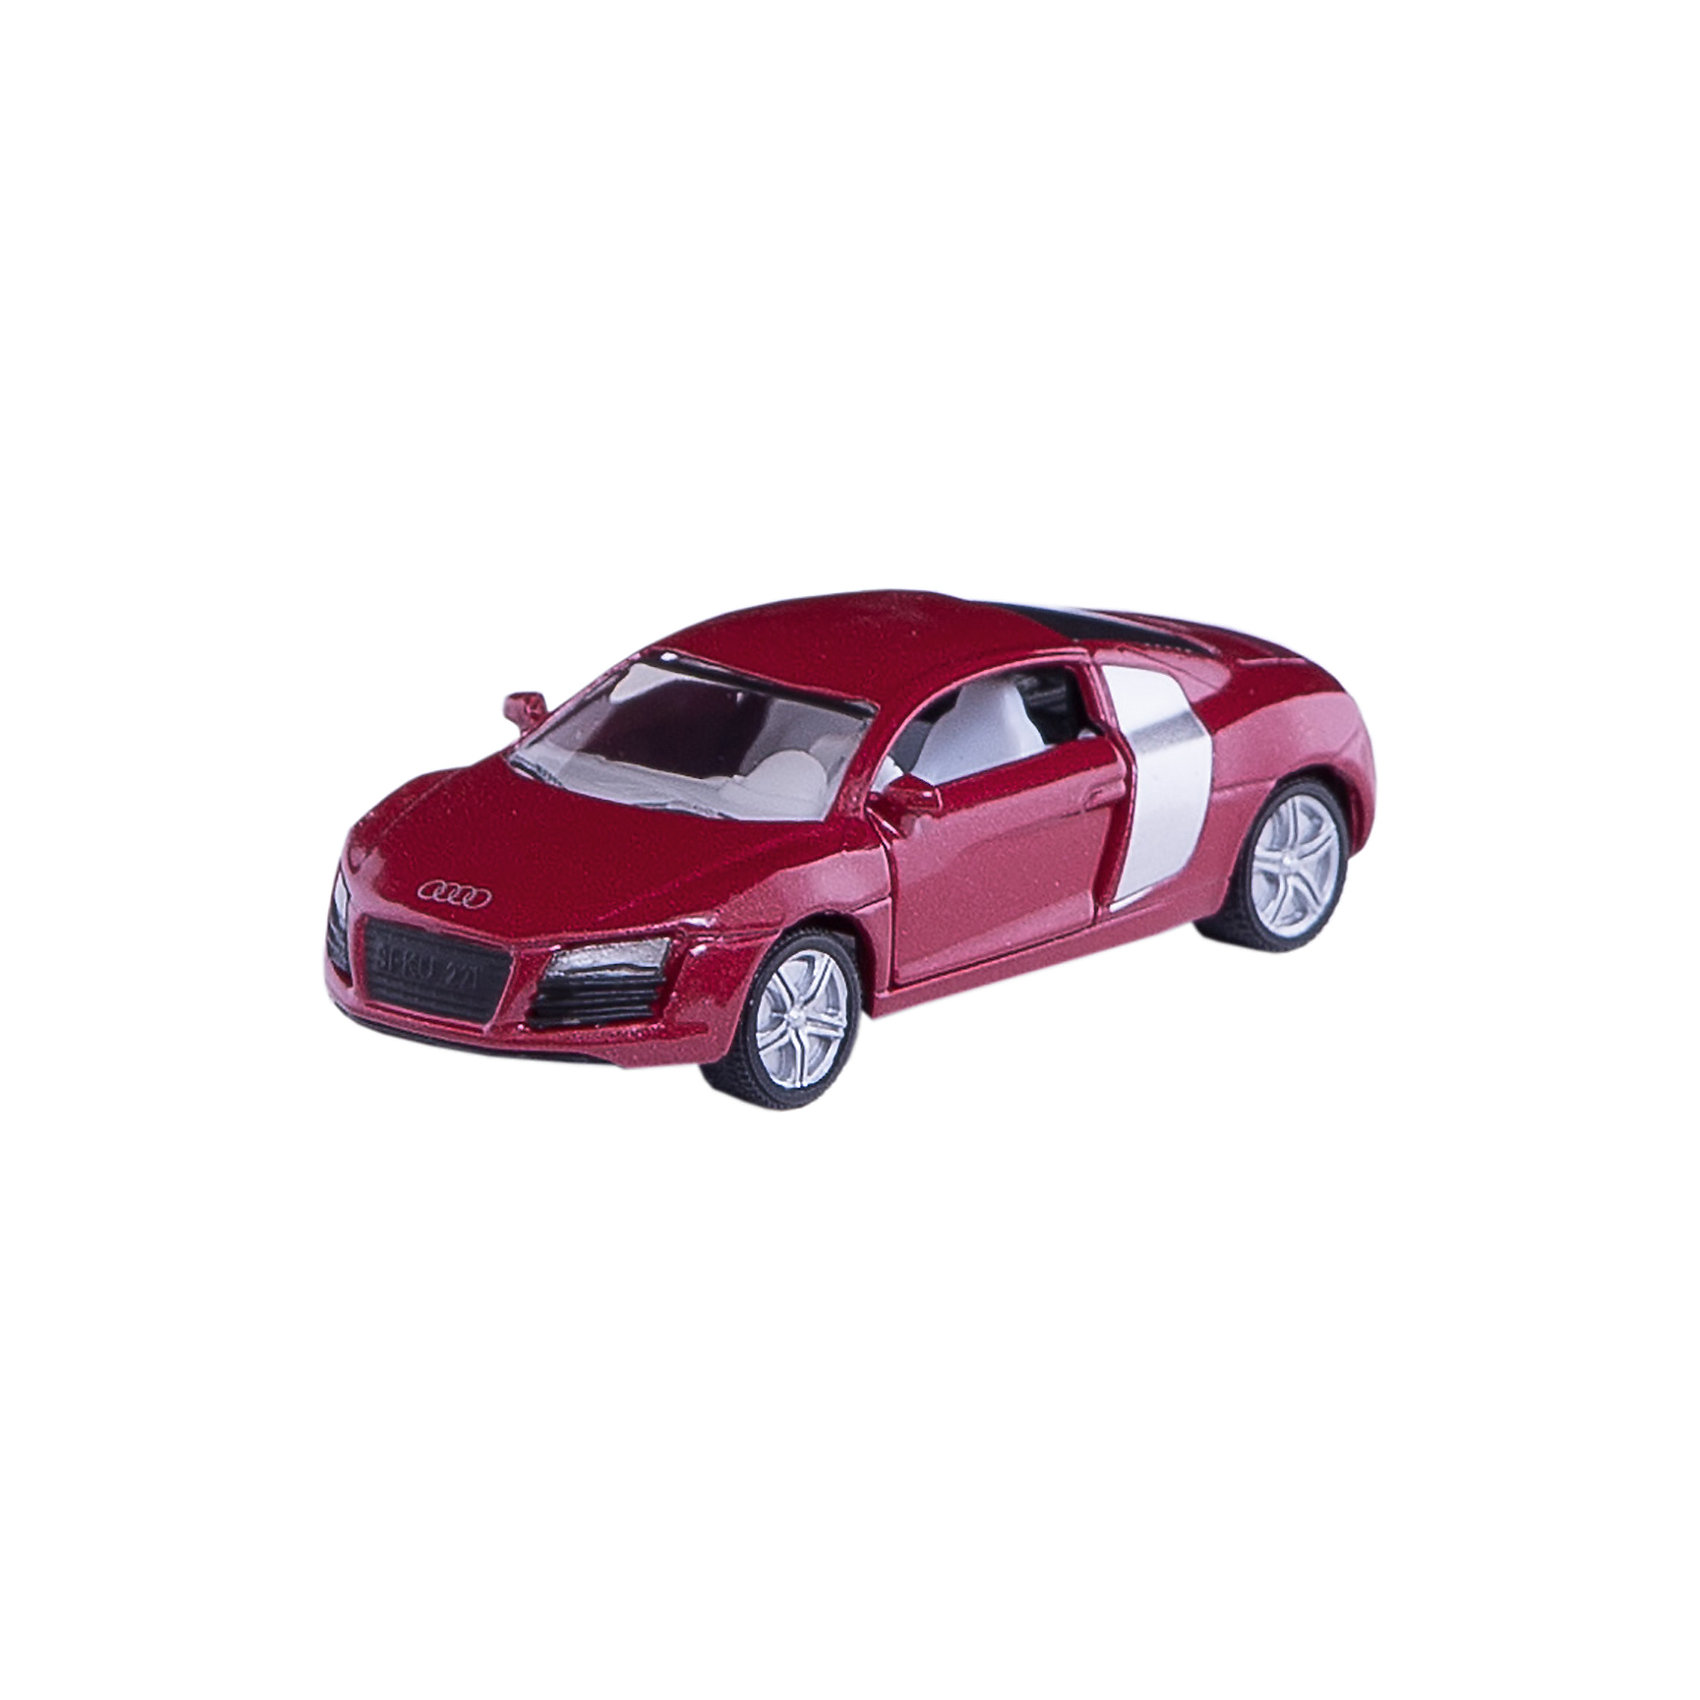 SIKU SIKU 1430 Audi R8 игрушка siku ауди r8 8 0 3 7 2 4см 1430